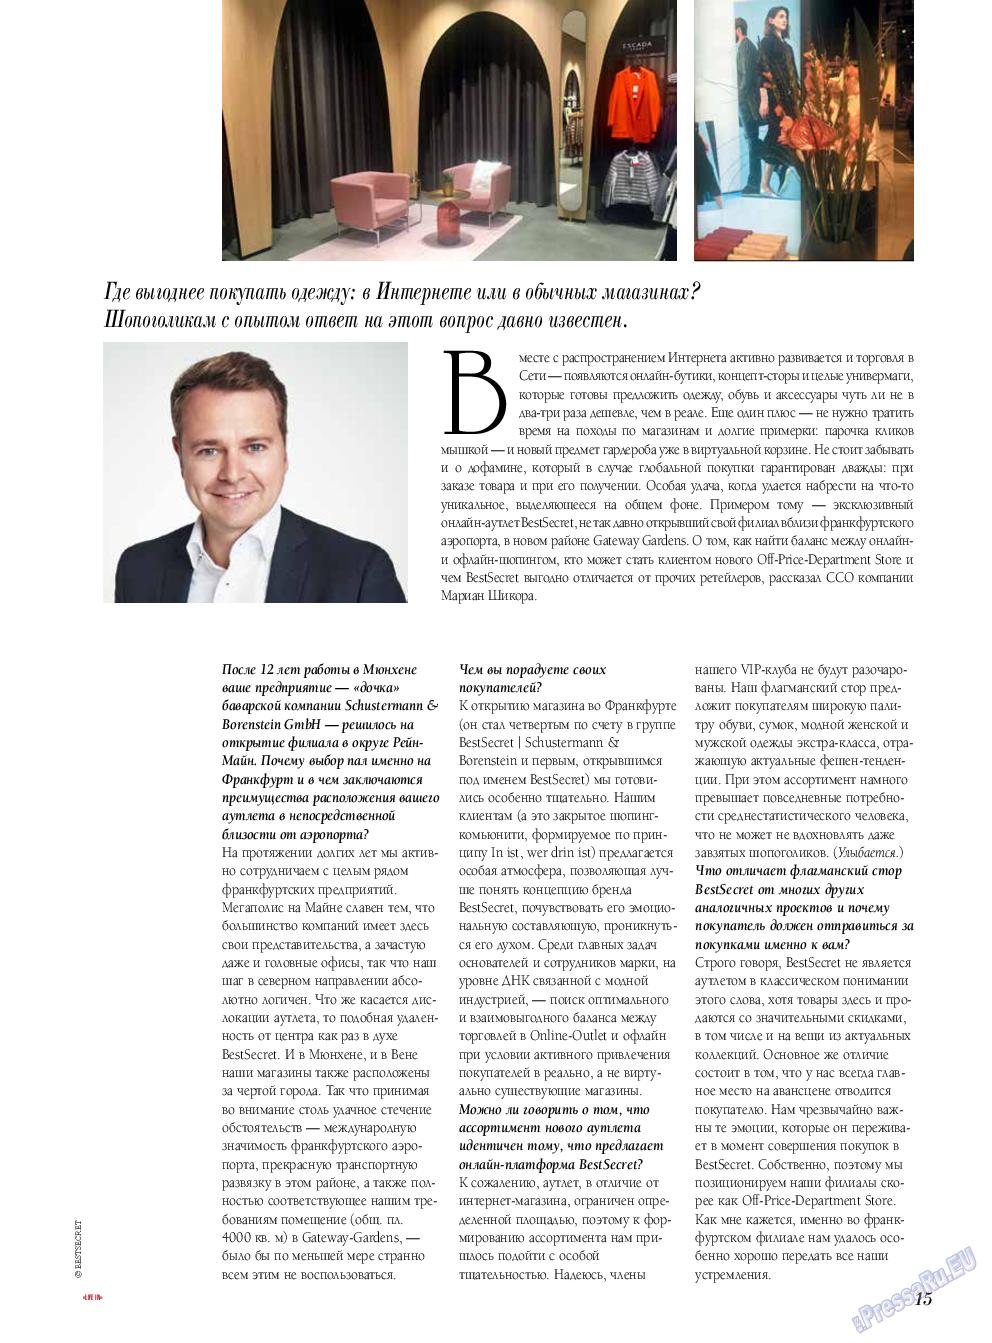 Life in Франкфурт (журнал). 2019 год, номер 44, стр. 15